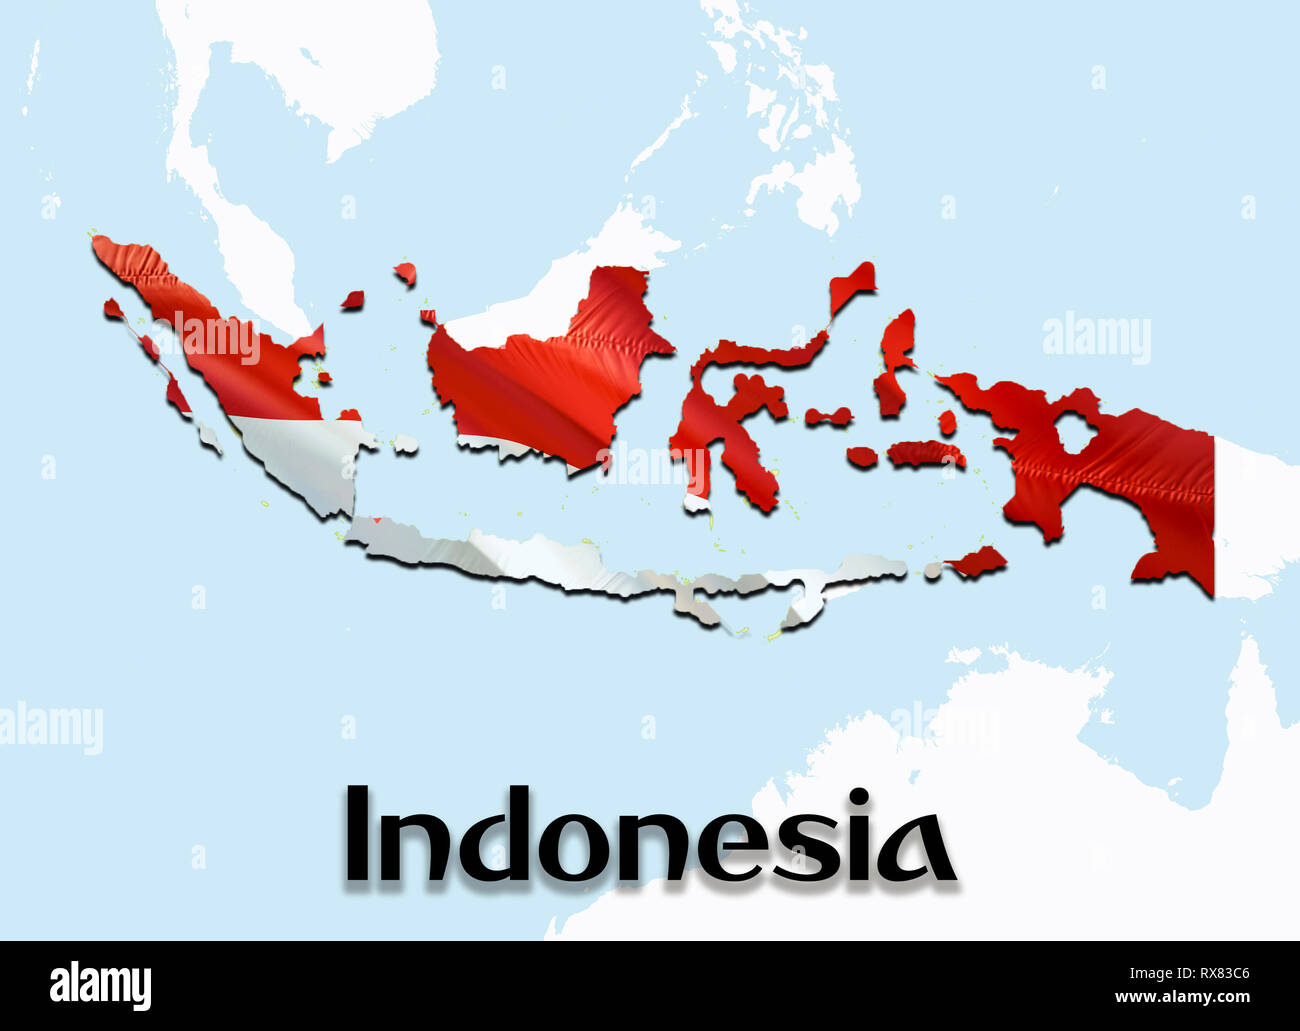 Indonesia Map Stock Photos & Indonesia Map Stock Images - Alamy on acholi map, uygur map, pan european map, quebecois map, biblical greek map, maluku island indonesia map, chichewa map, gaulish map, valencian map, sri lankan map, sumatra map, world map, jakarta indonesia map, serb map, india map, haiti map, bangladesh map, java map, zande map, inuit cultures map,